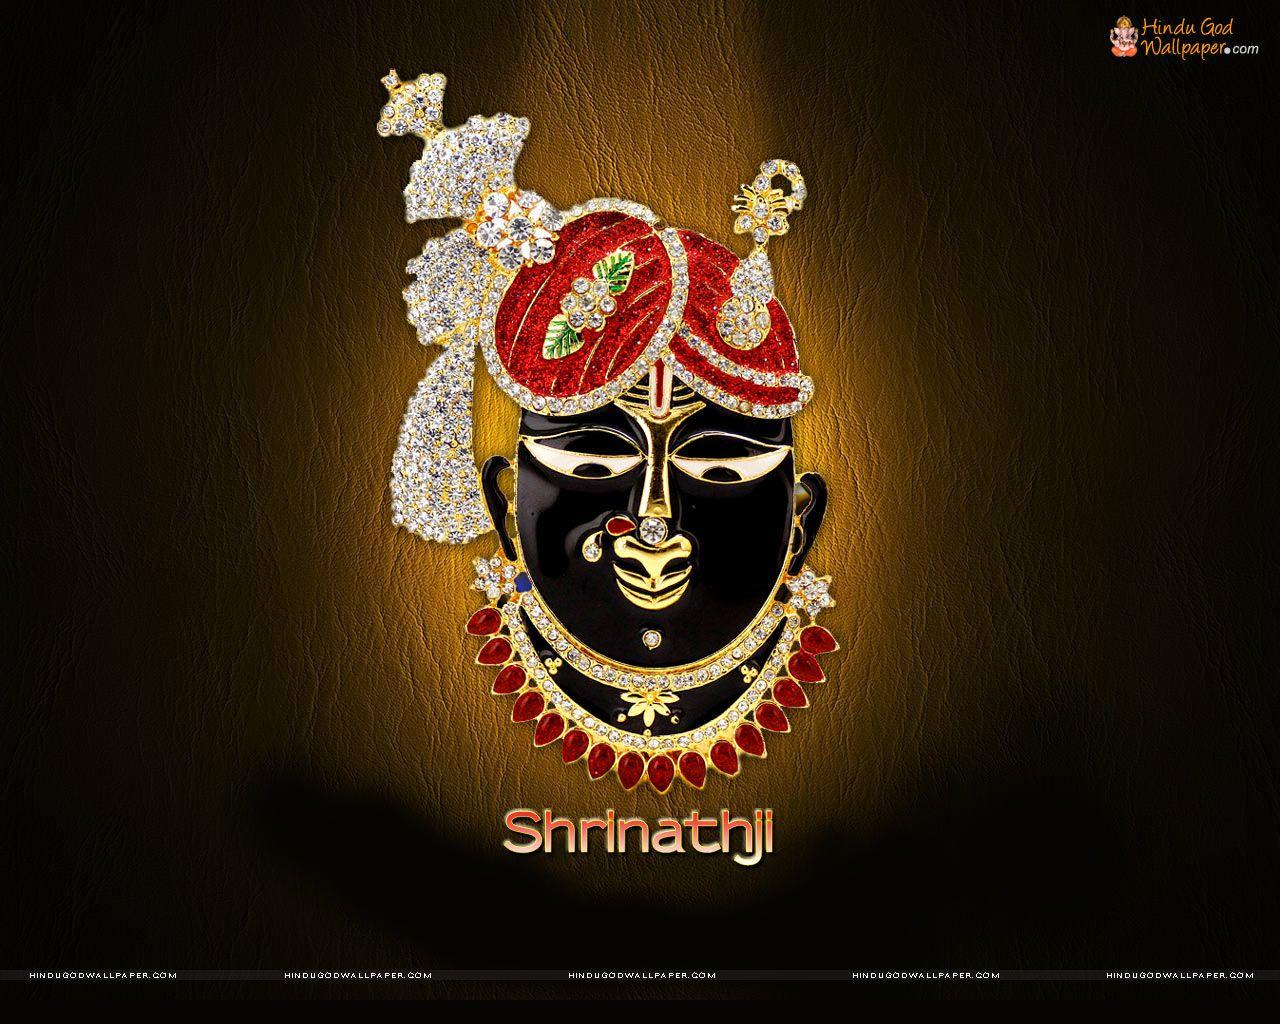 Shrinathji Hd Wallpaper Free Download Krushna Wallpaper